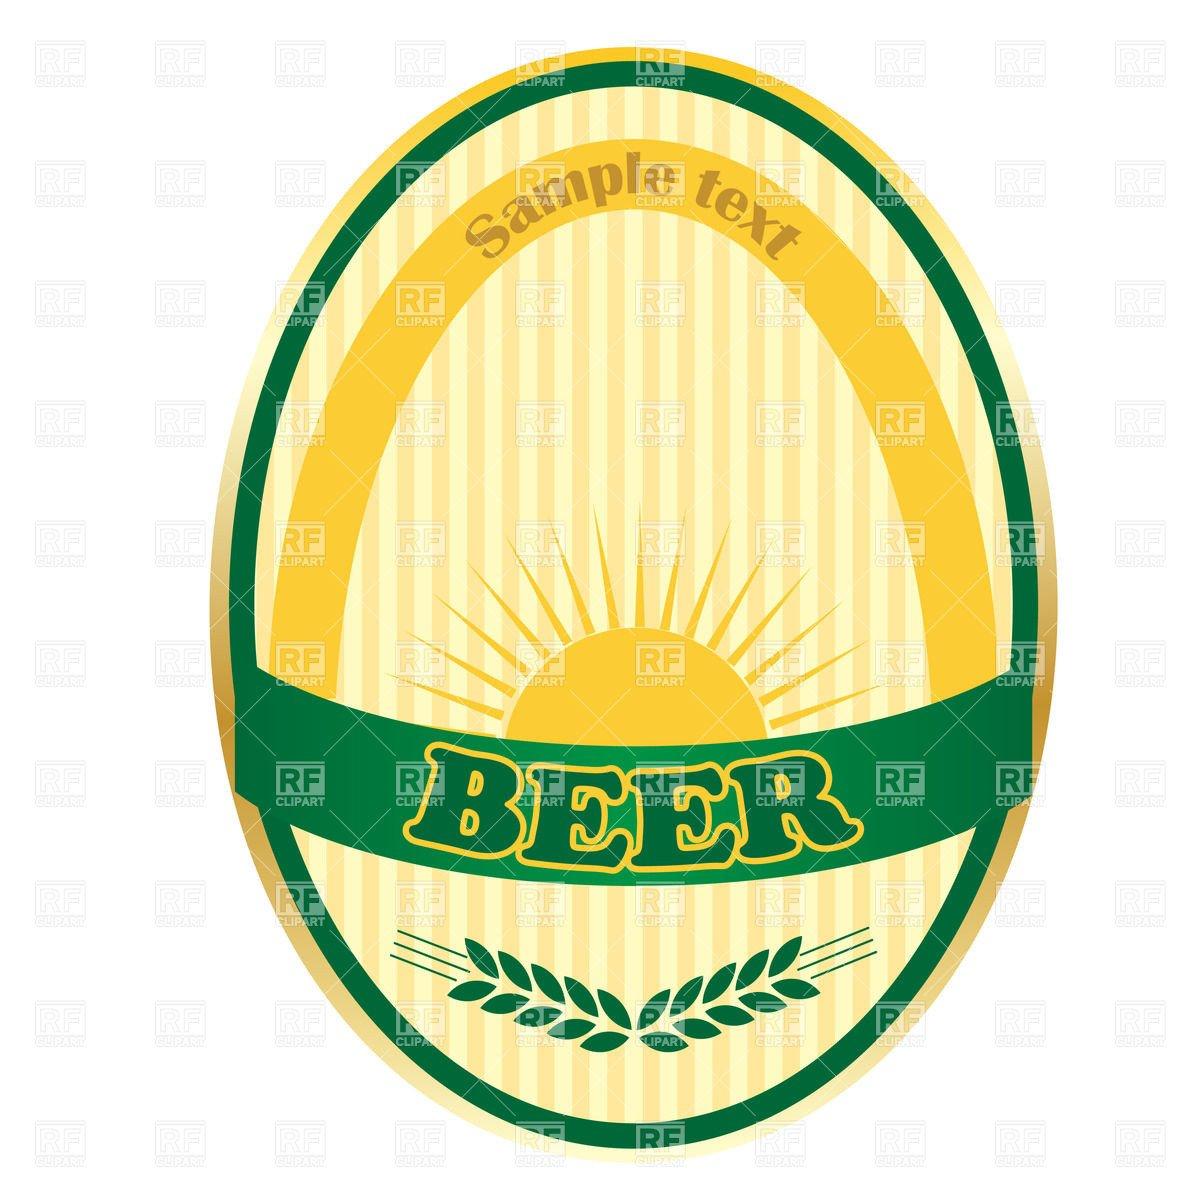 Beer Label Template Free Beer Label Template